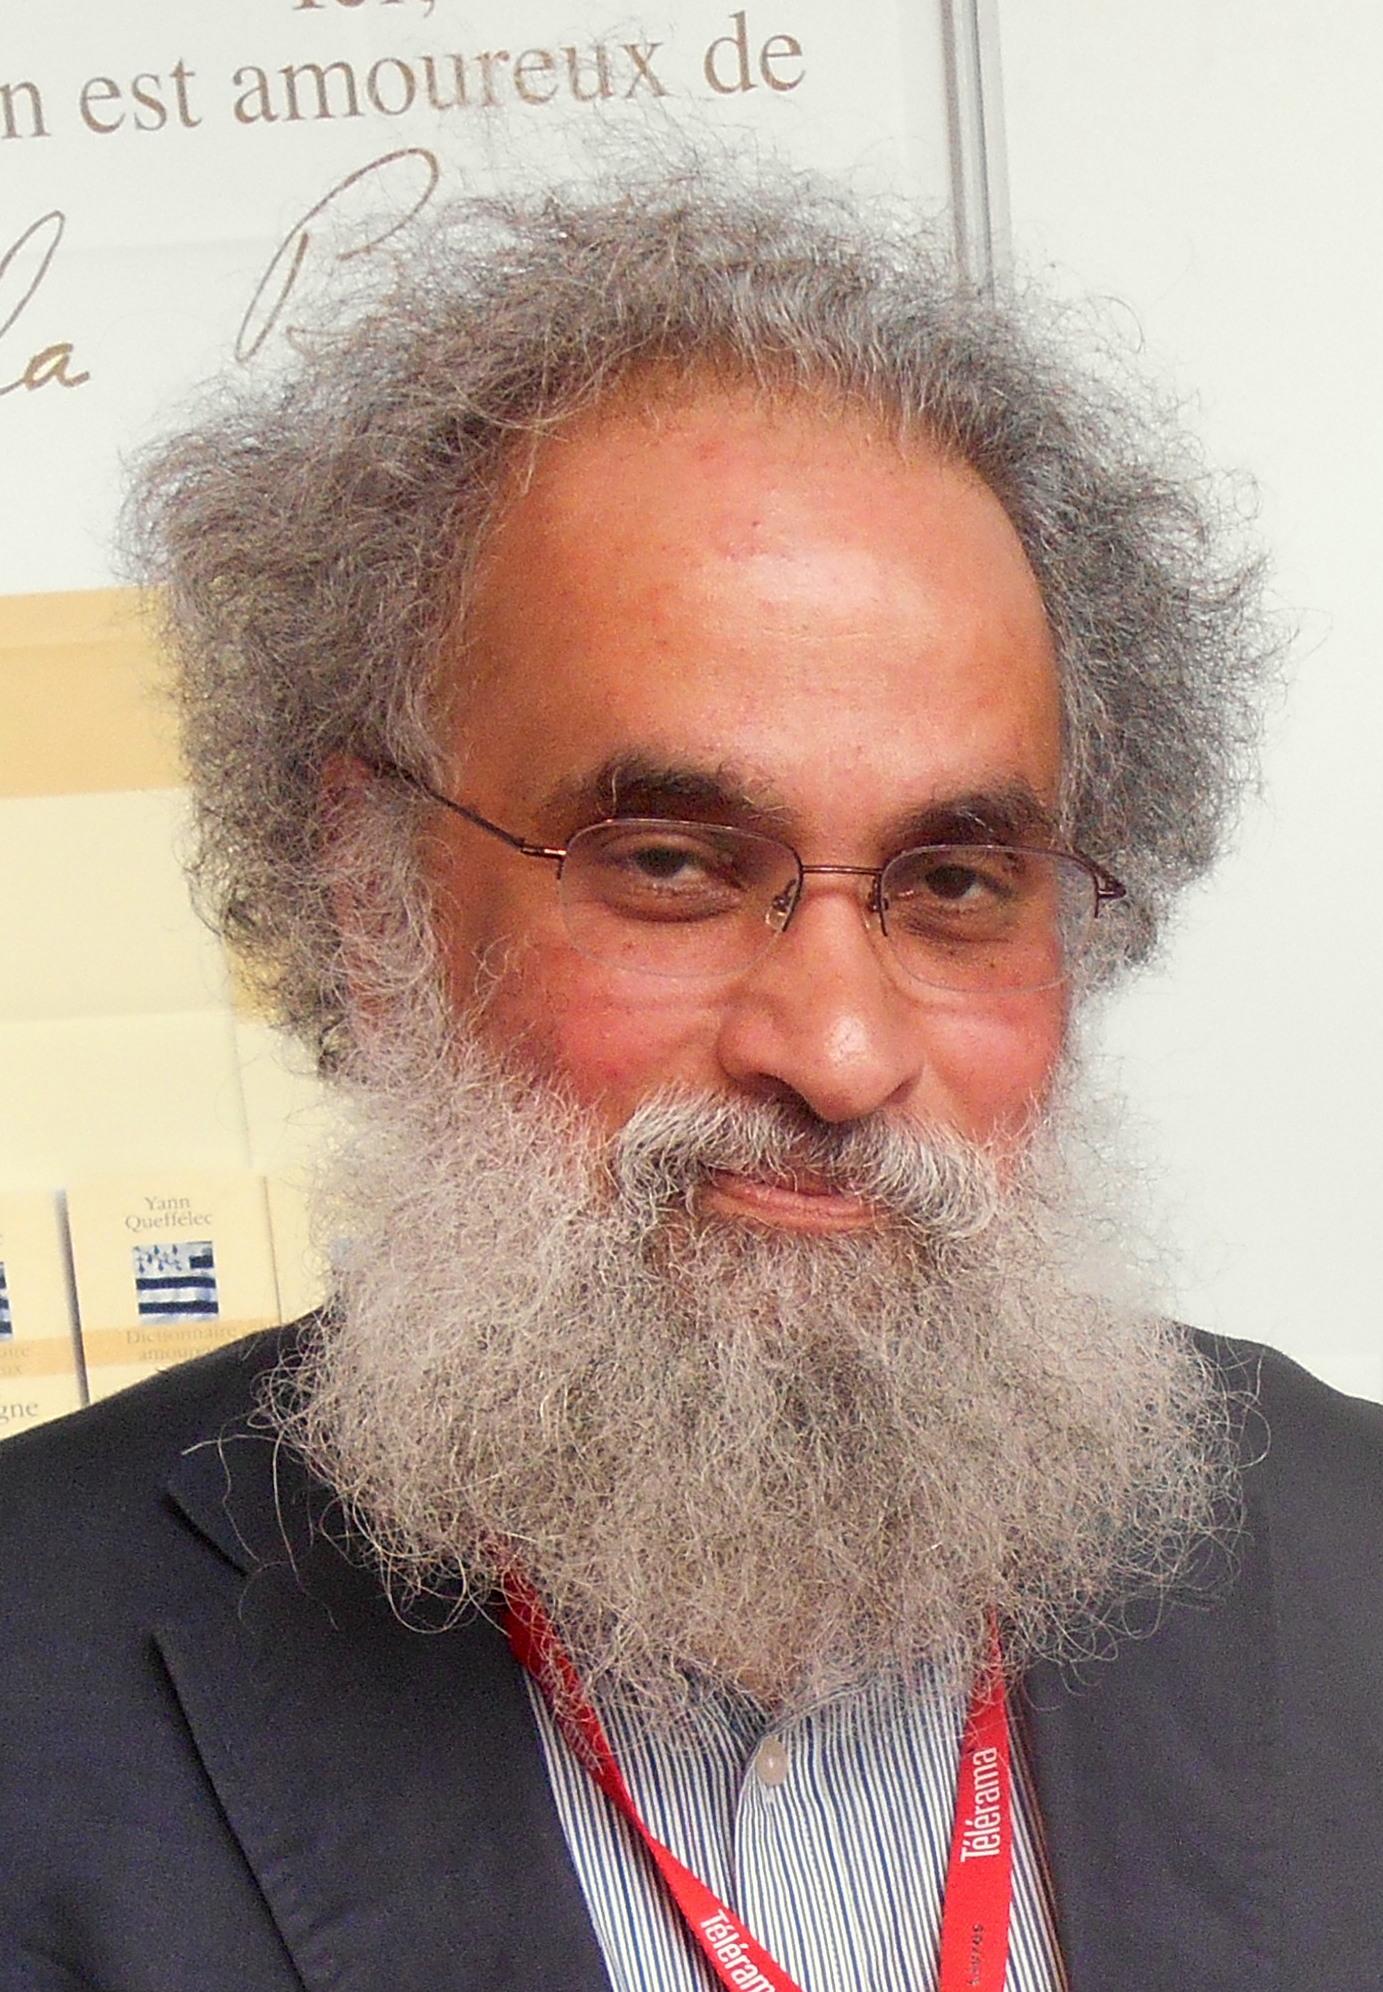 Sanjay Subrahmanyam at Festival Étonnant Voyageur de Saint-Malo (France), 2014.